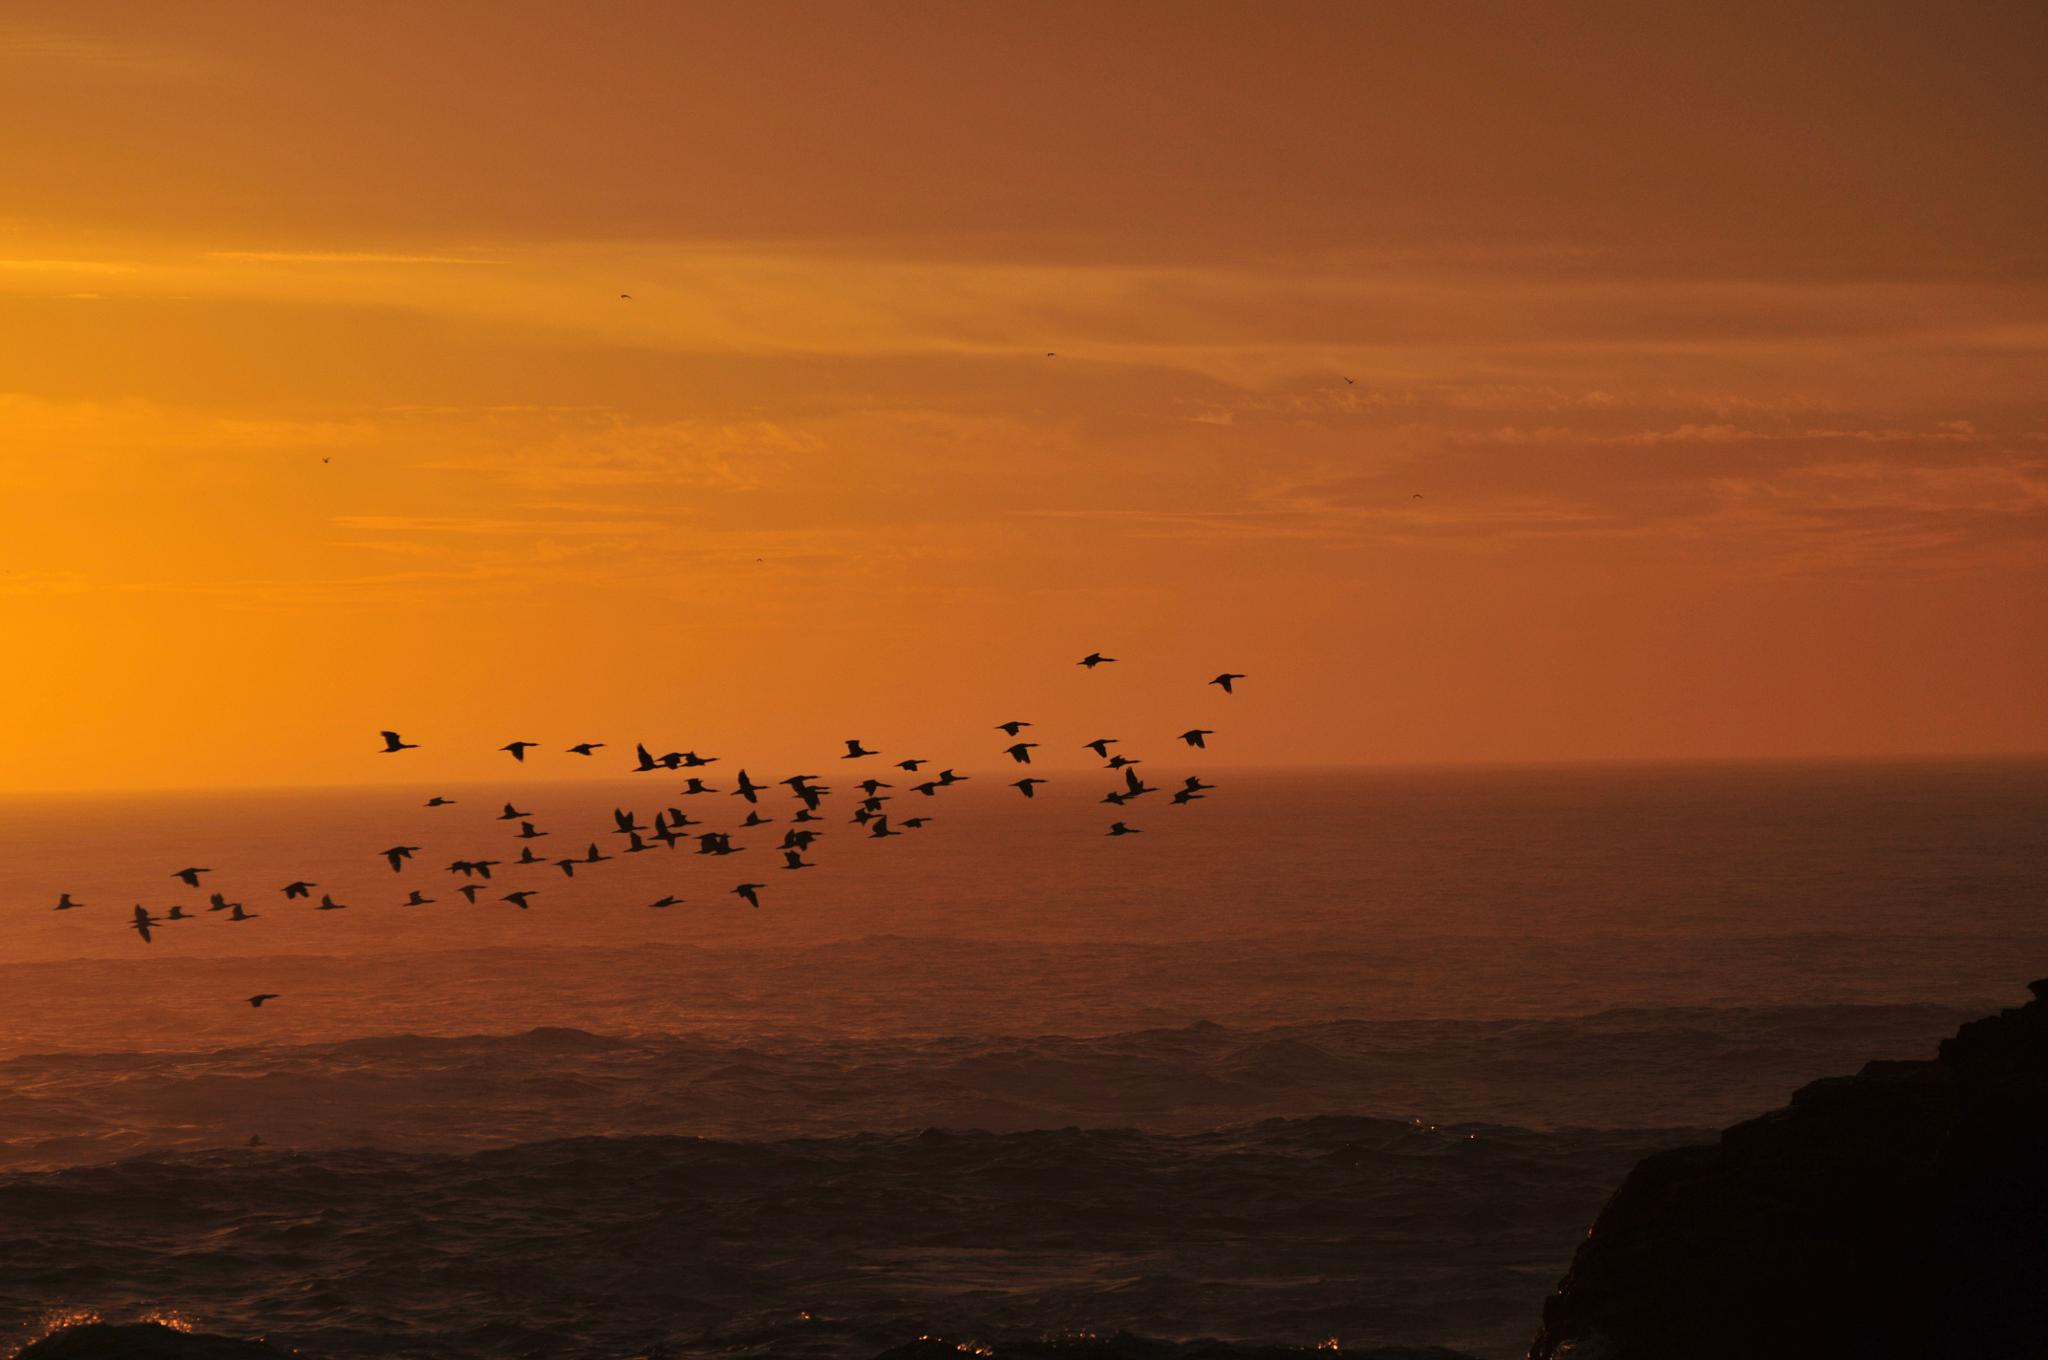 Sunset Birds by Marius